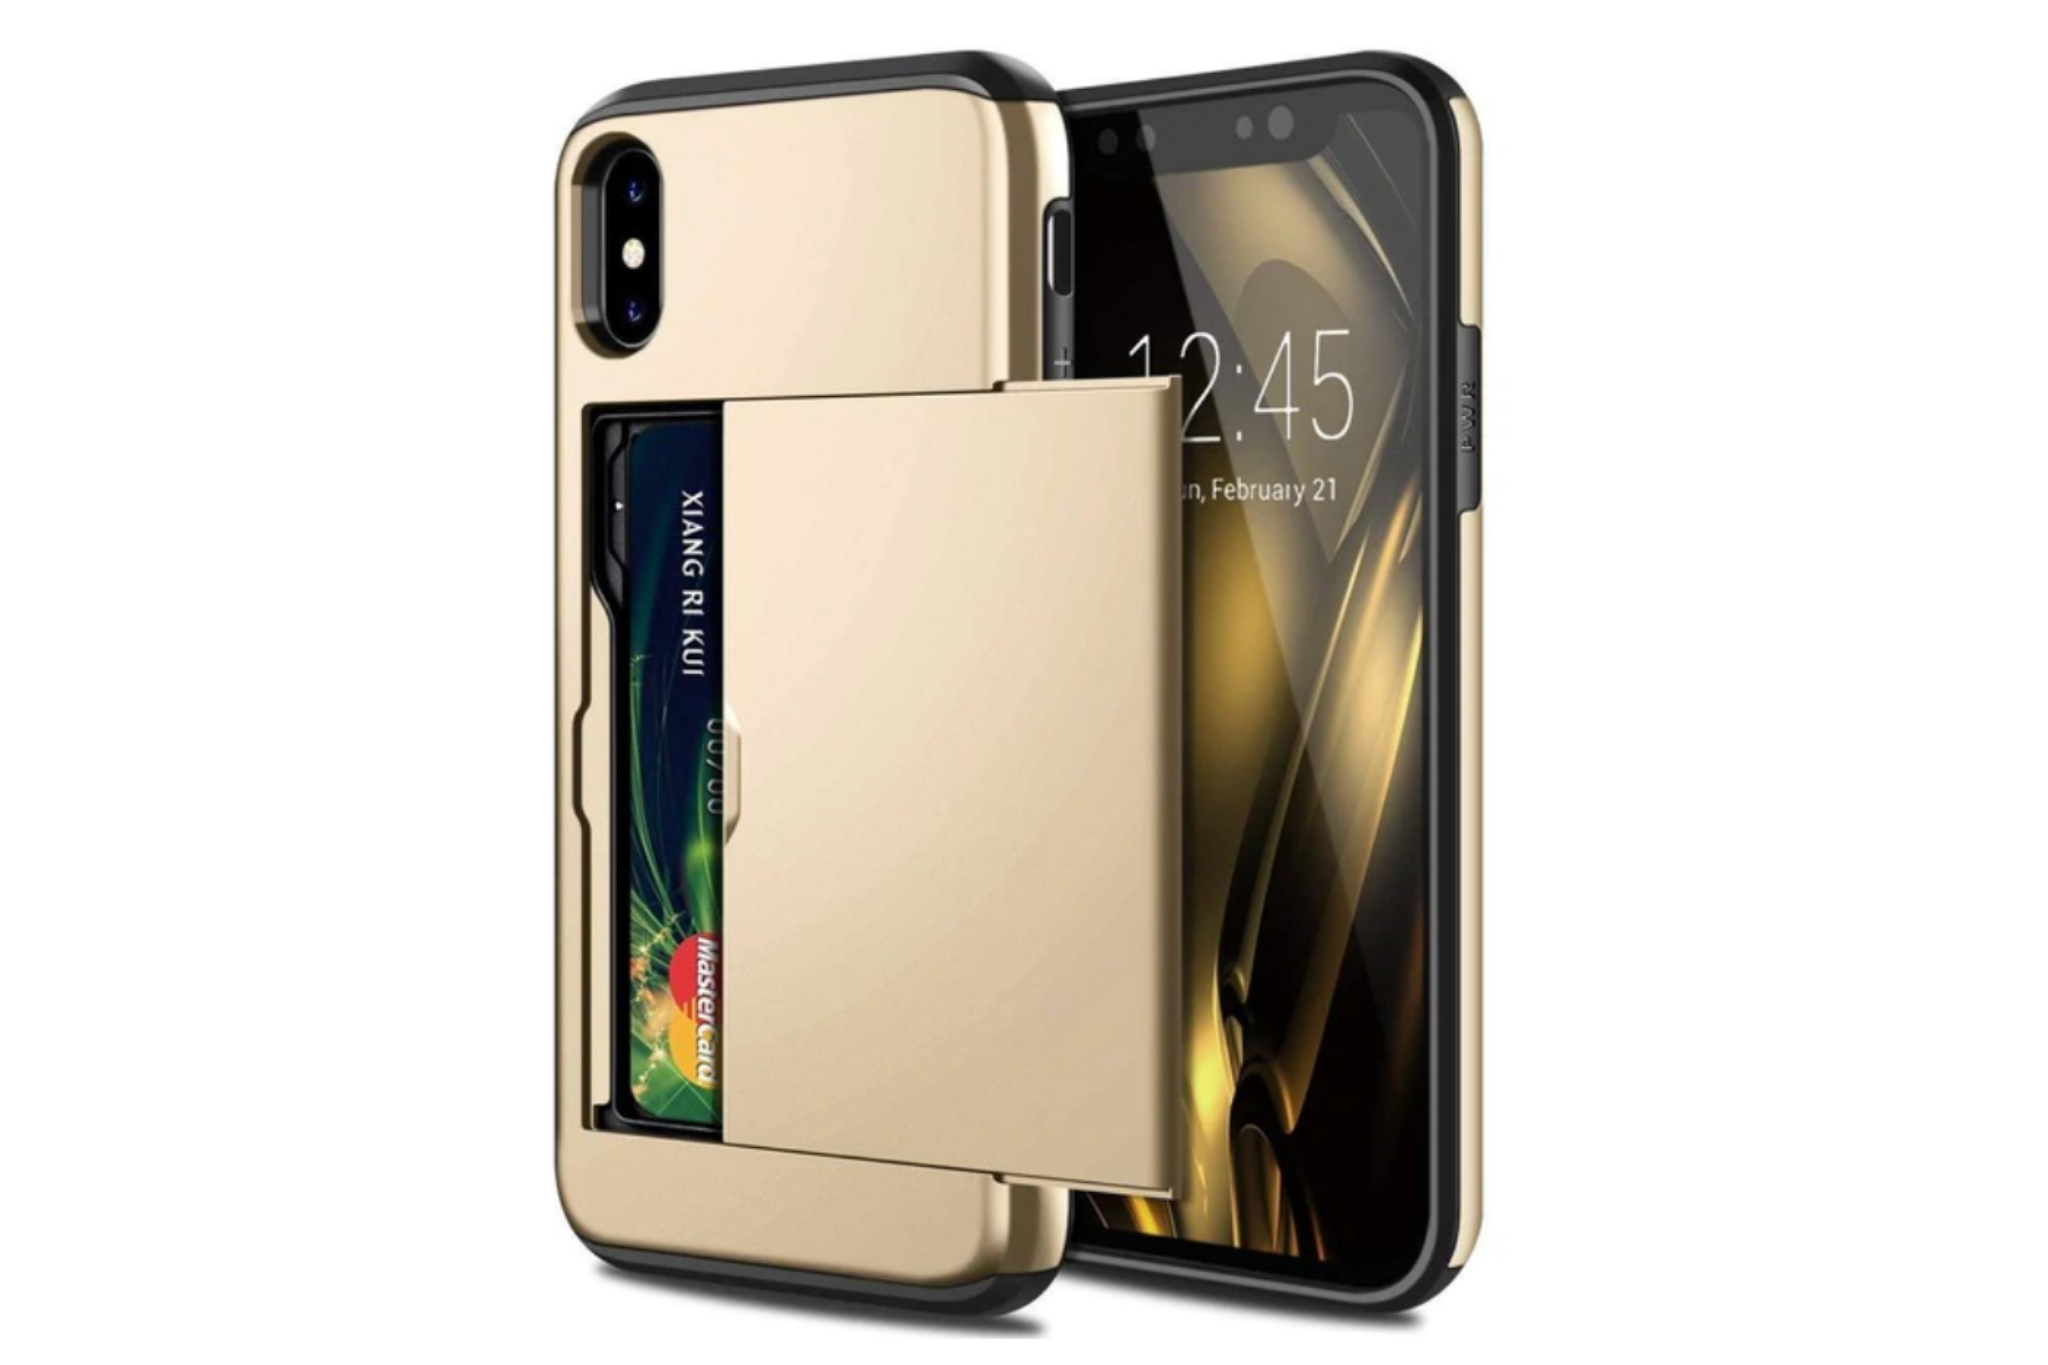 Smartphonehoesje iPhone XR | Pasjesschuif goud